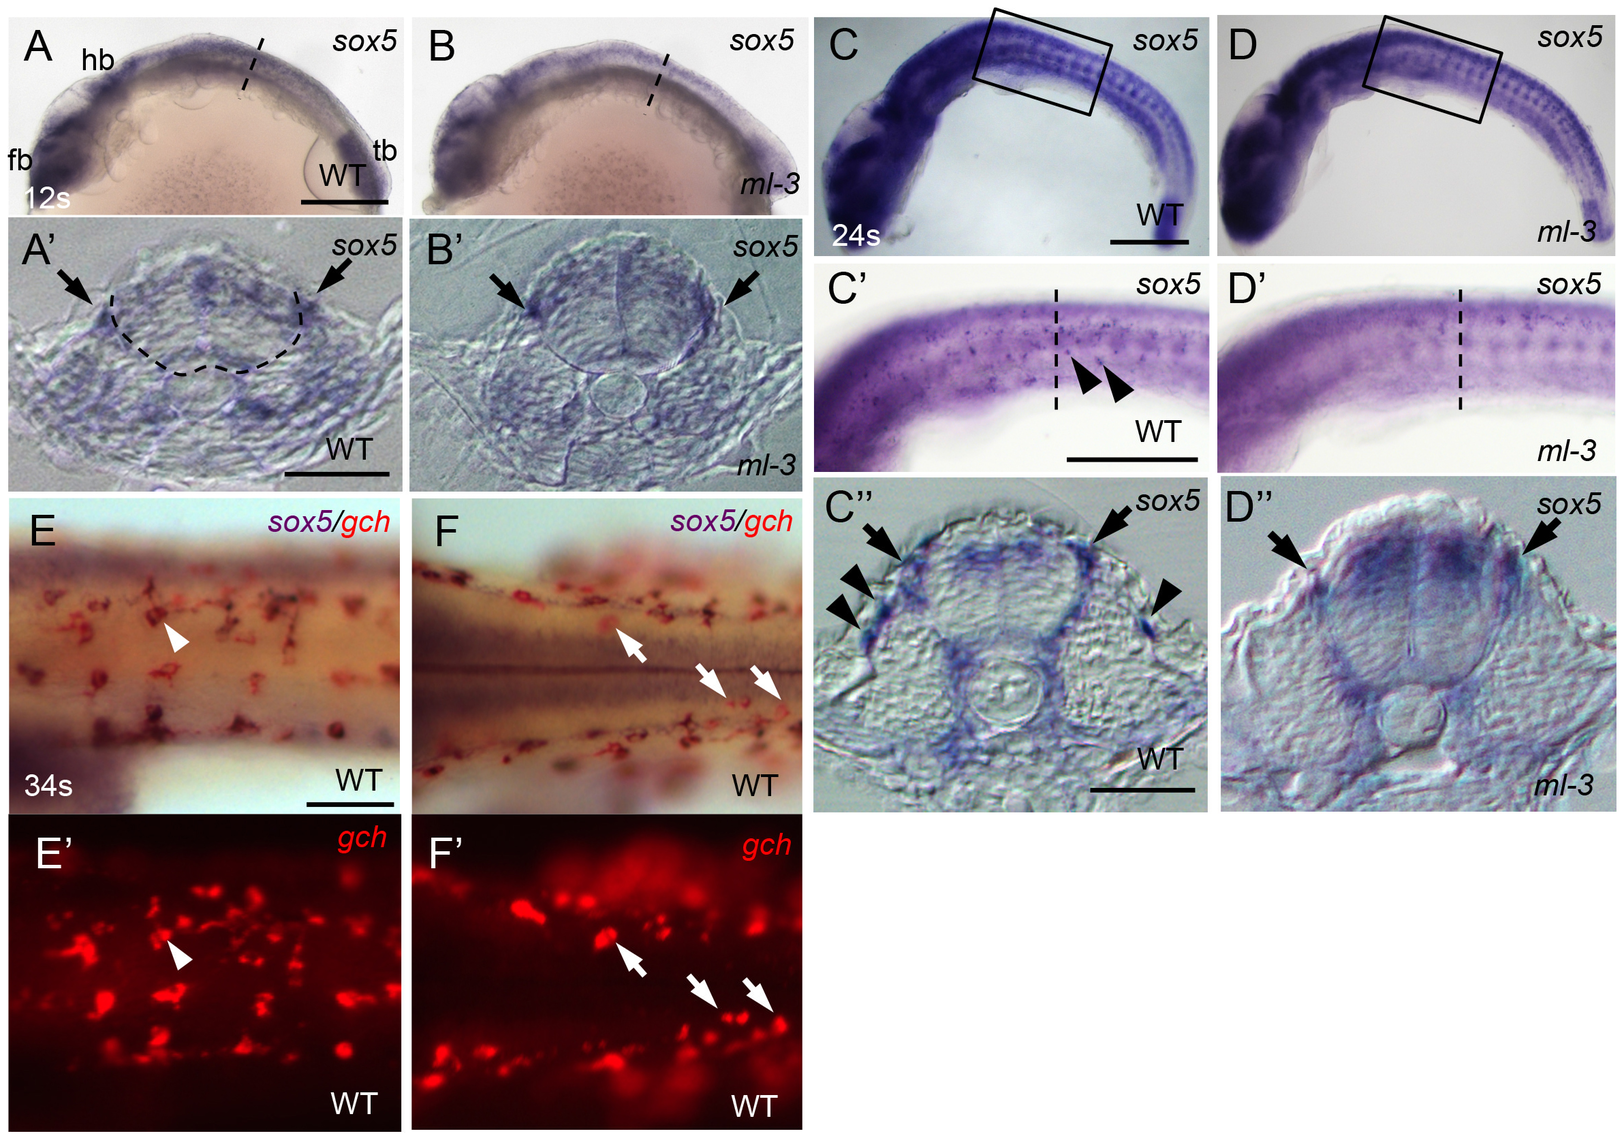 Expression pattern of medaka <i>sox5</i> in WT and <i>ml-3</i> mutant embryos.